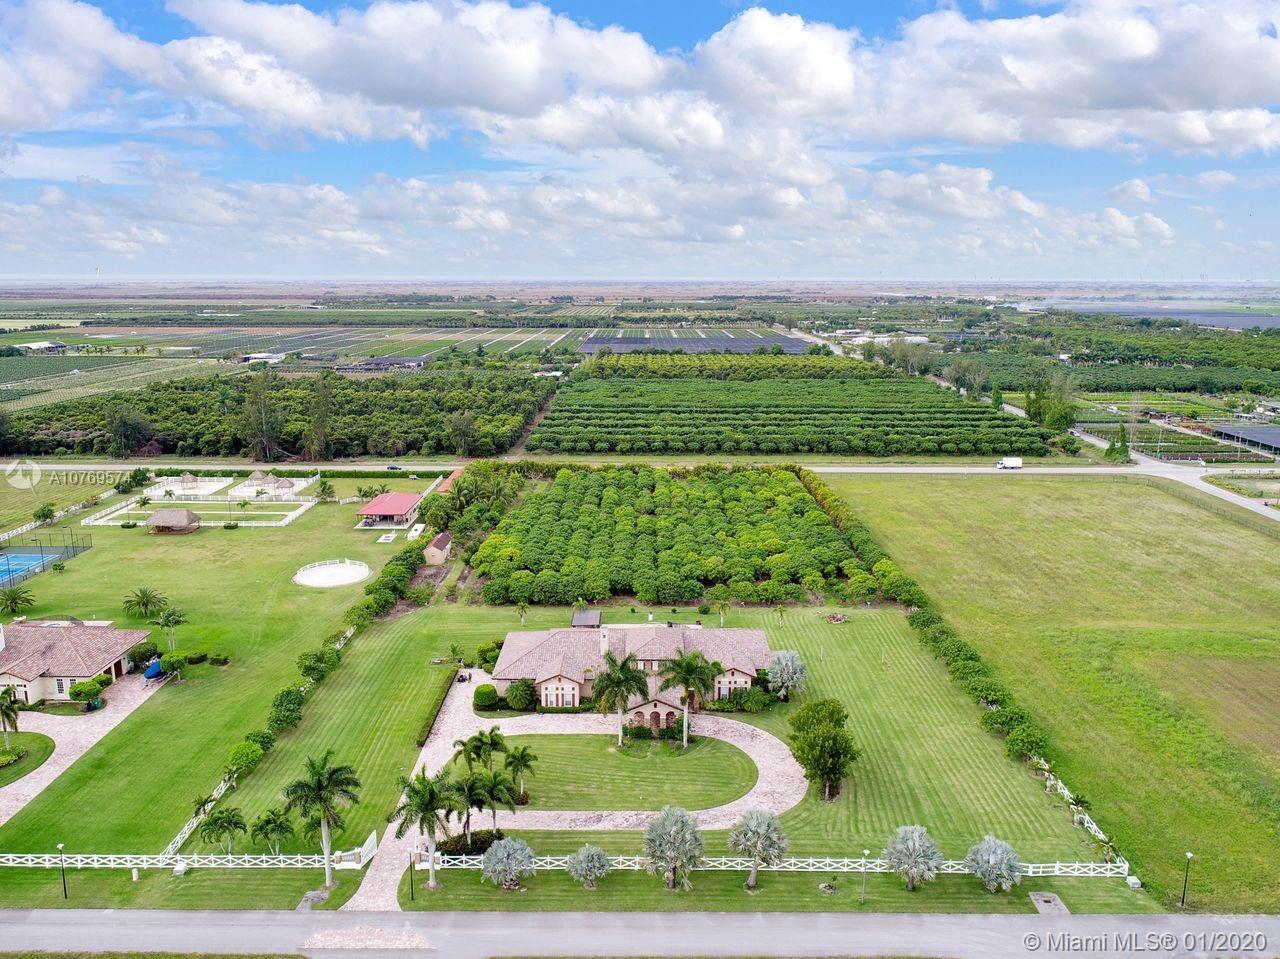 31310 215th Ave, Homestead, FL 33030 - Homestead, FL real estate listing